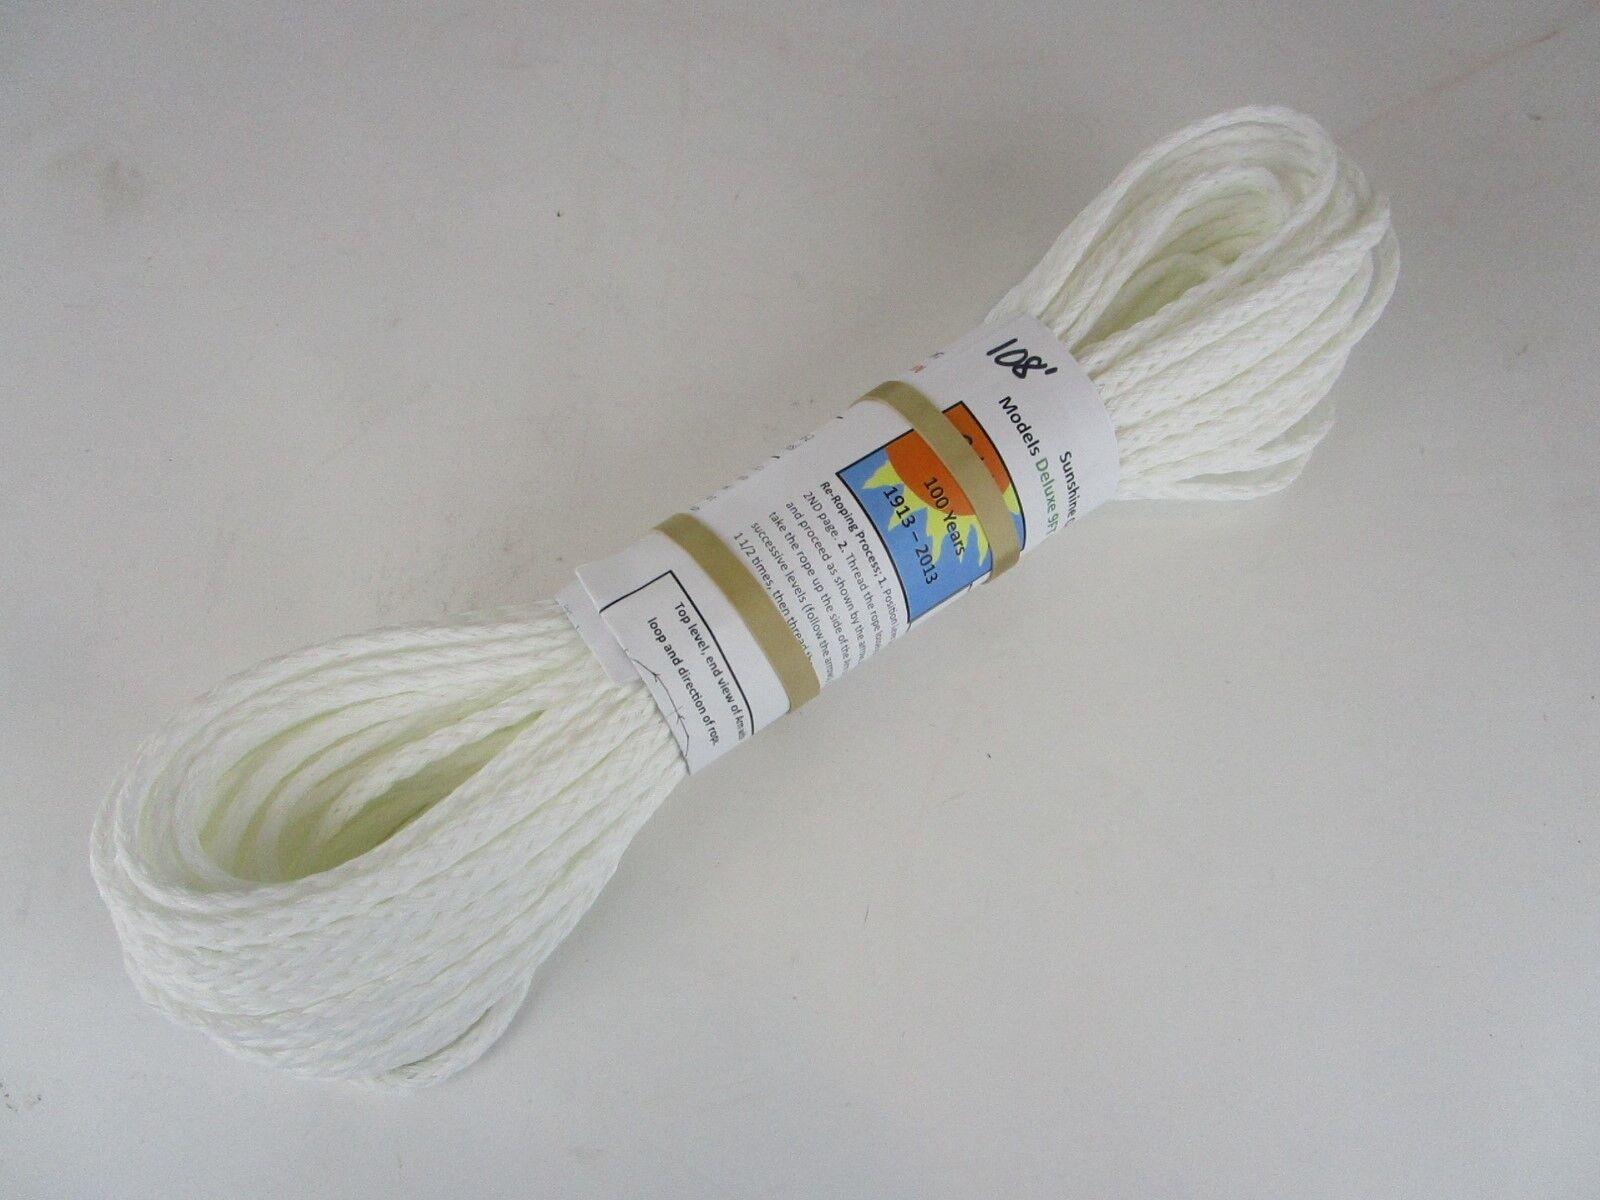 108 feet 3 16 inch diameter polyethylene UV resistance rope Sunshine Clothesline